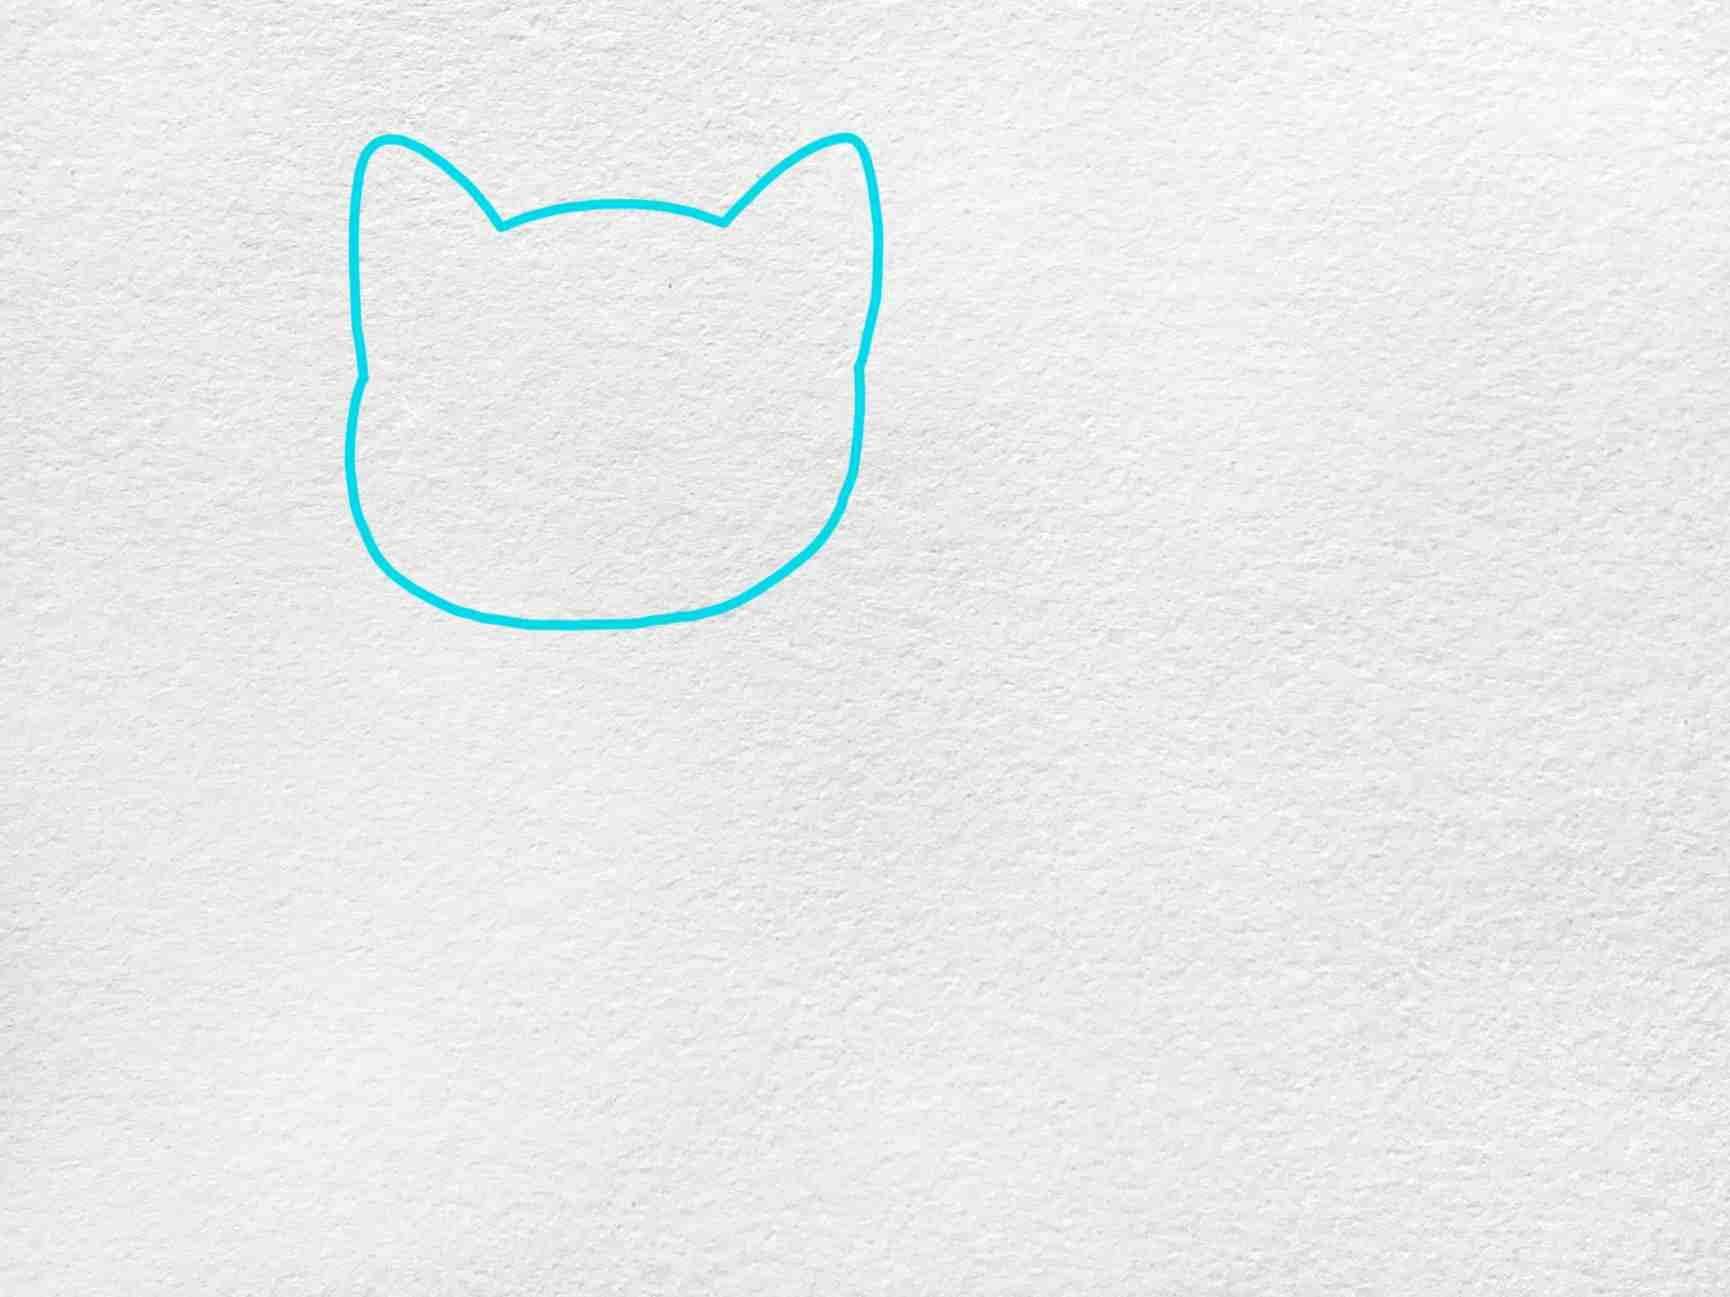 Cute Kitty Drawing: Step 1